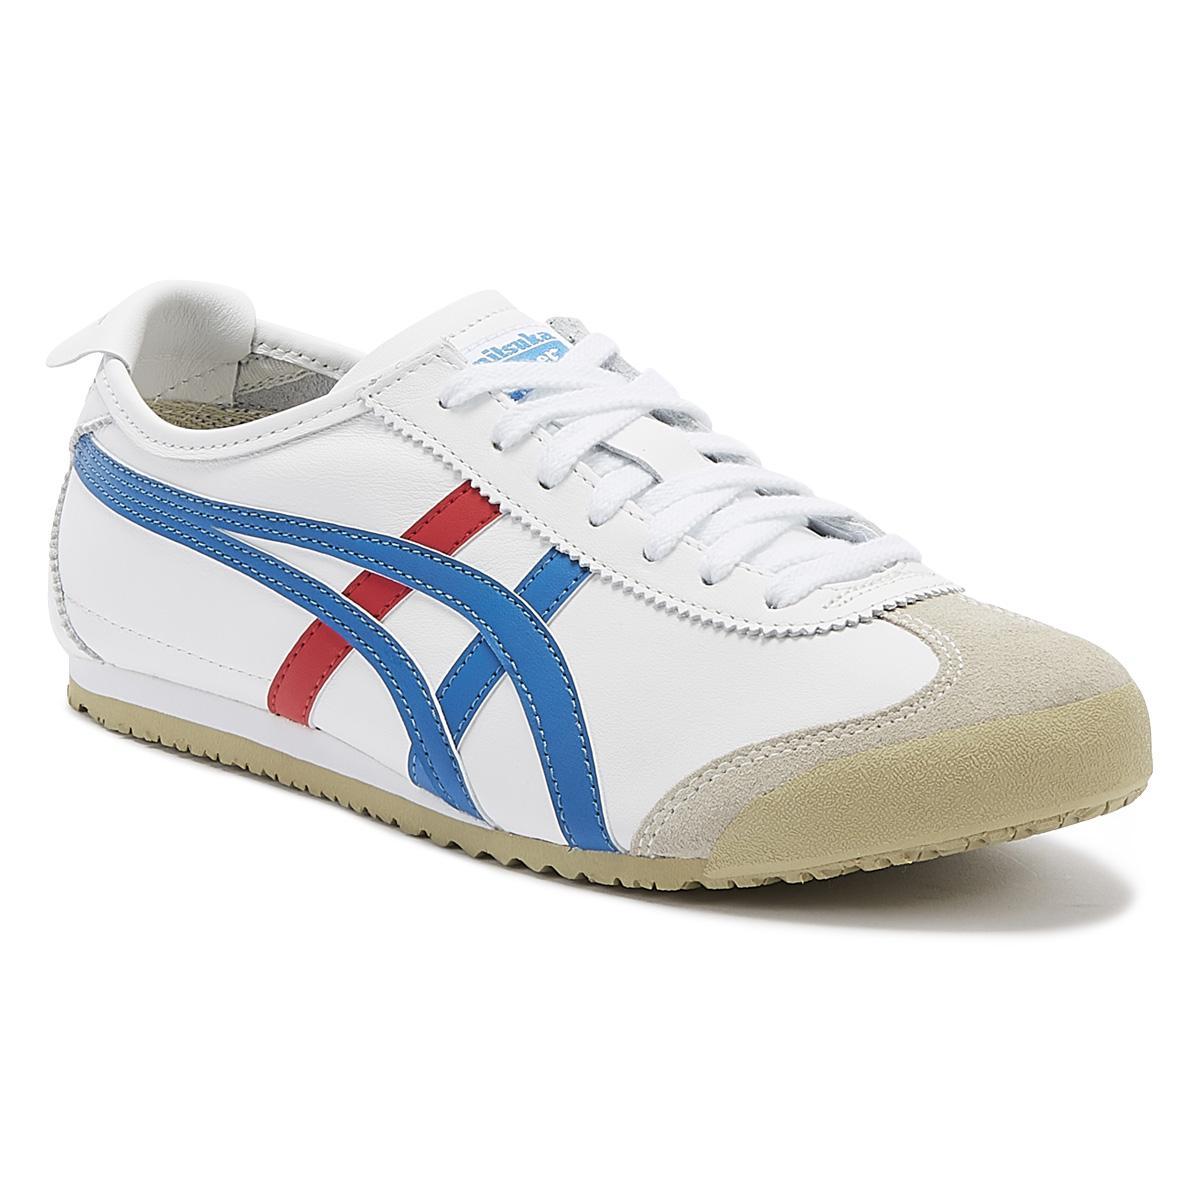 low priced 08b03 de8fe Mexico 66 Mens White / Blue Sneakers